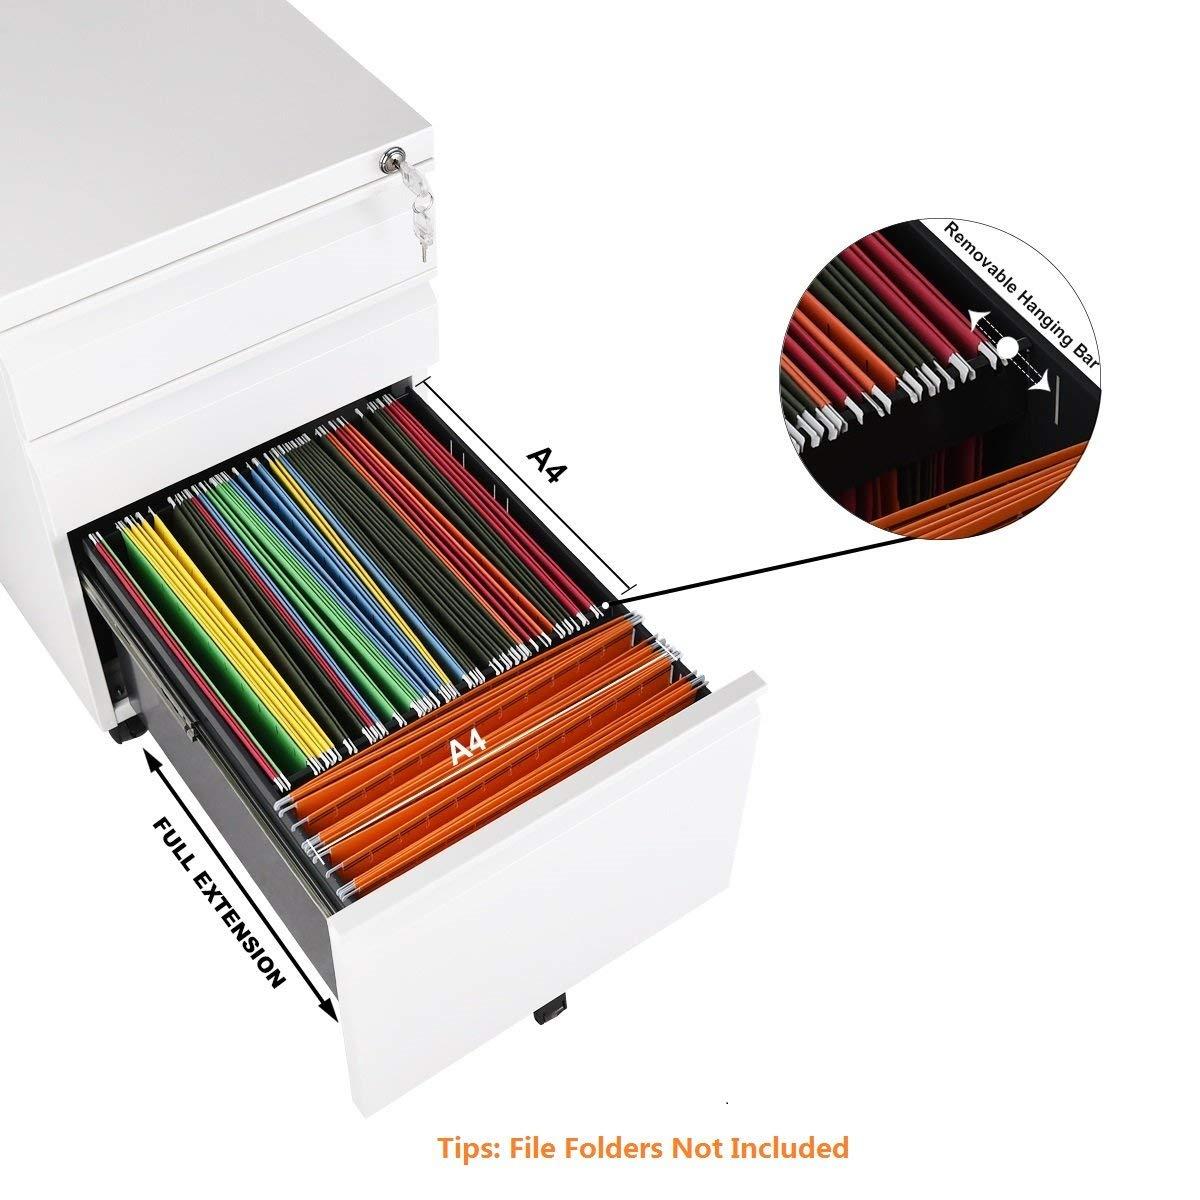 Lockable White DEVAISE Mobile 3 Drawer Filing Cabinet//Pedestal for A4 ; All-Steel 60cm H